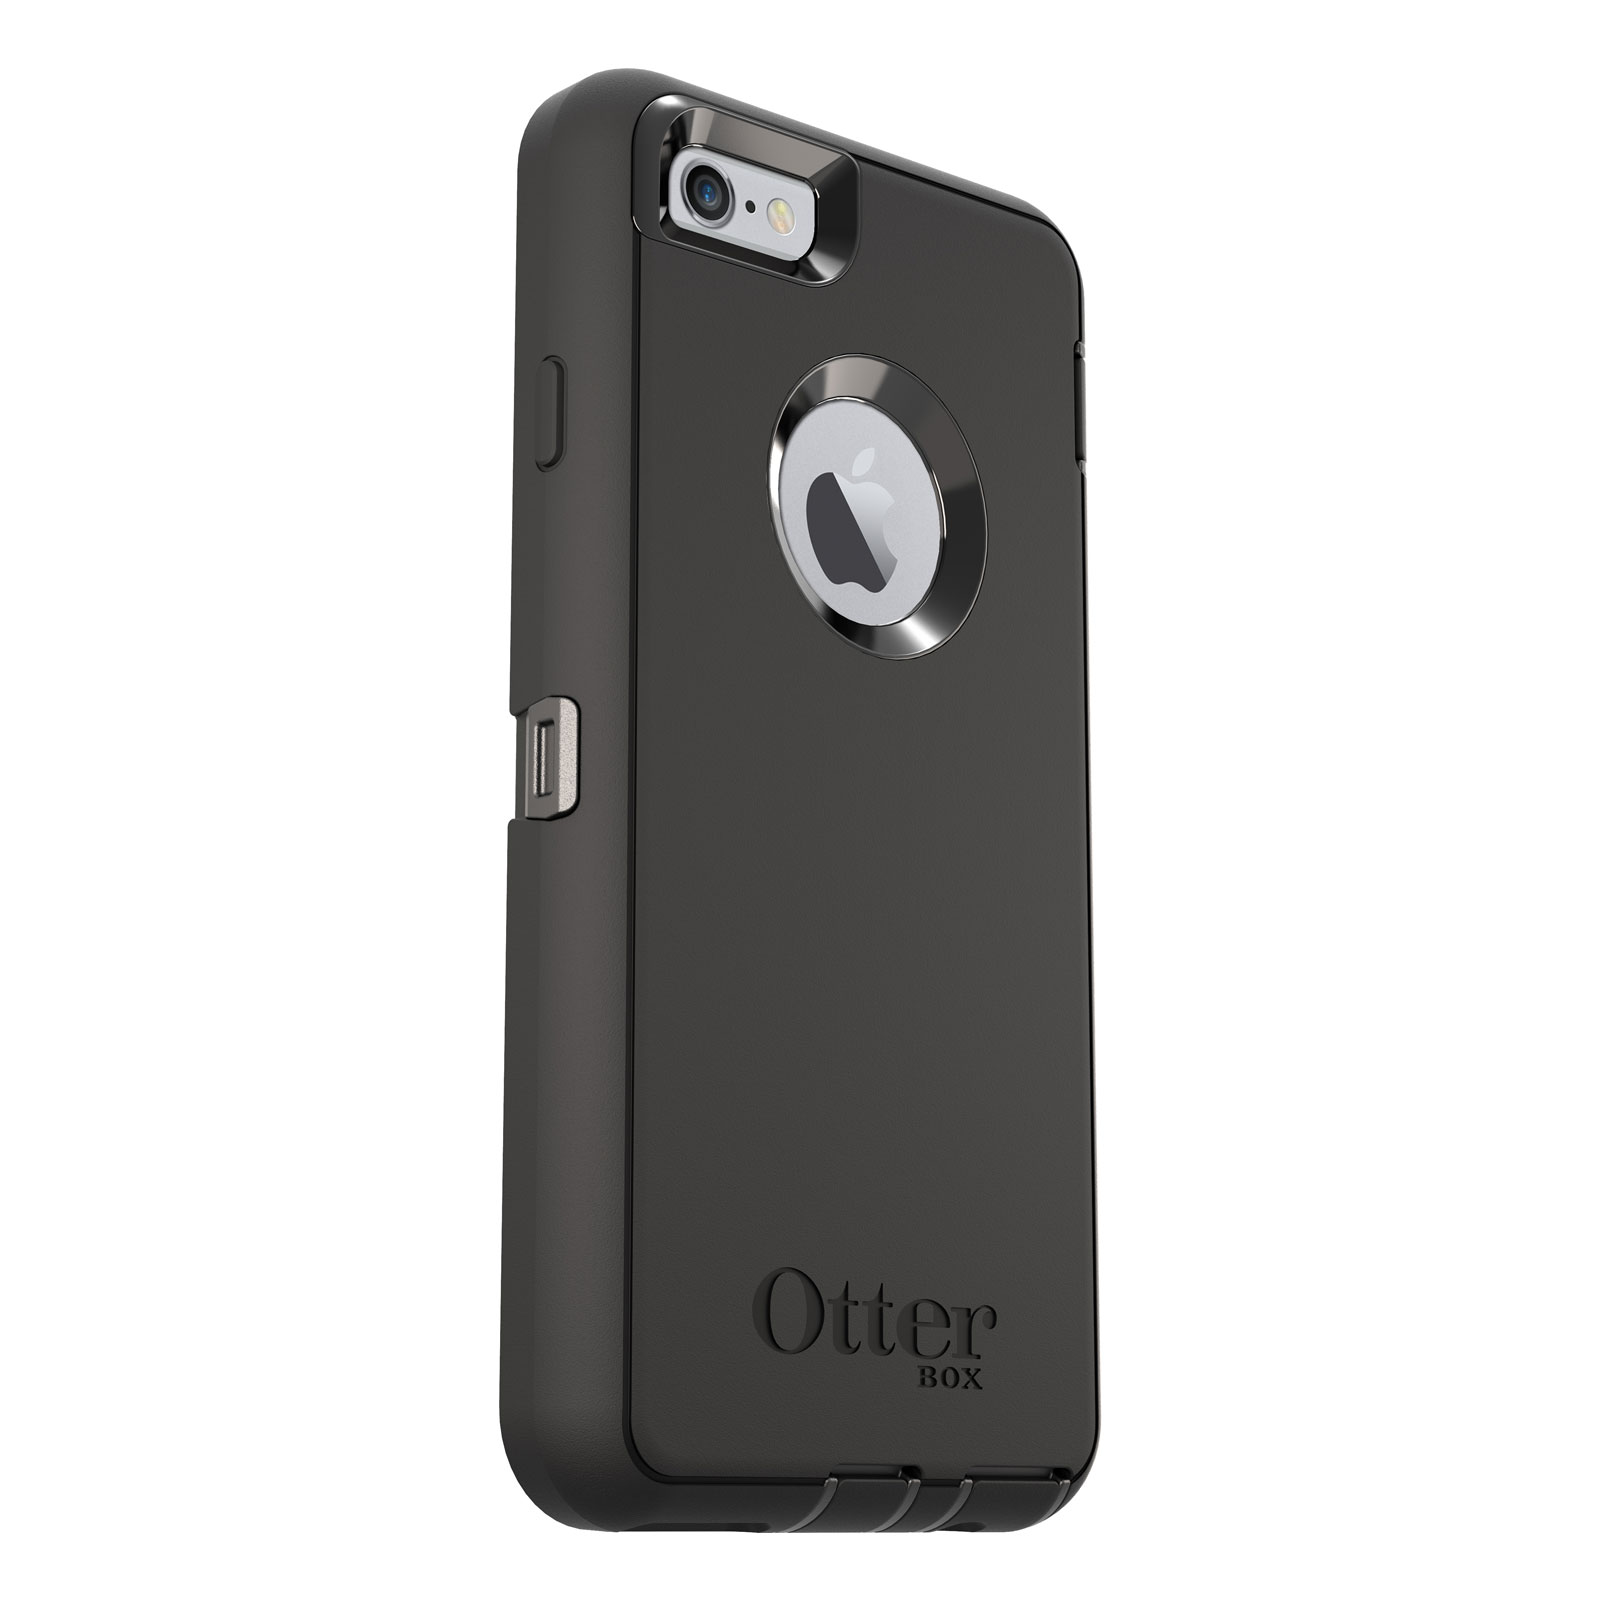 otterbox defender noir iphone 6 6s etui t l phone. Black Bedroom Furniture Sets. Home Design Ideas